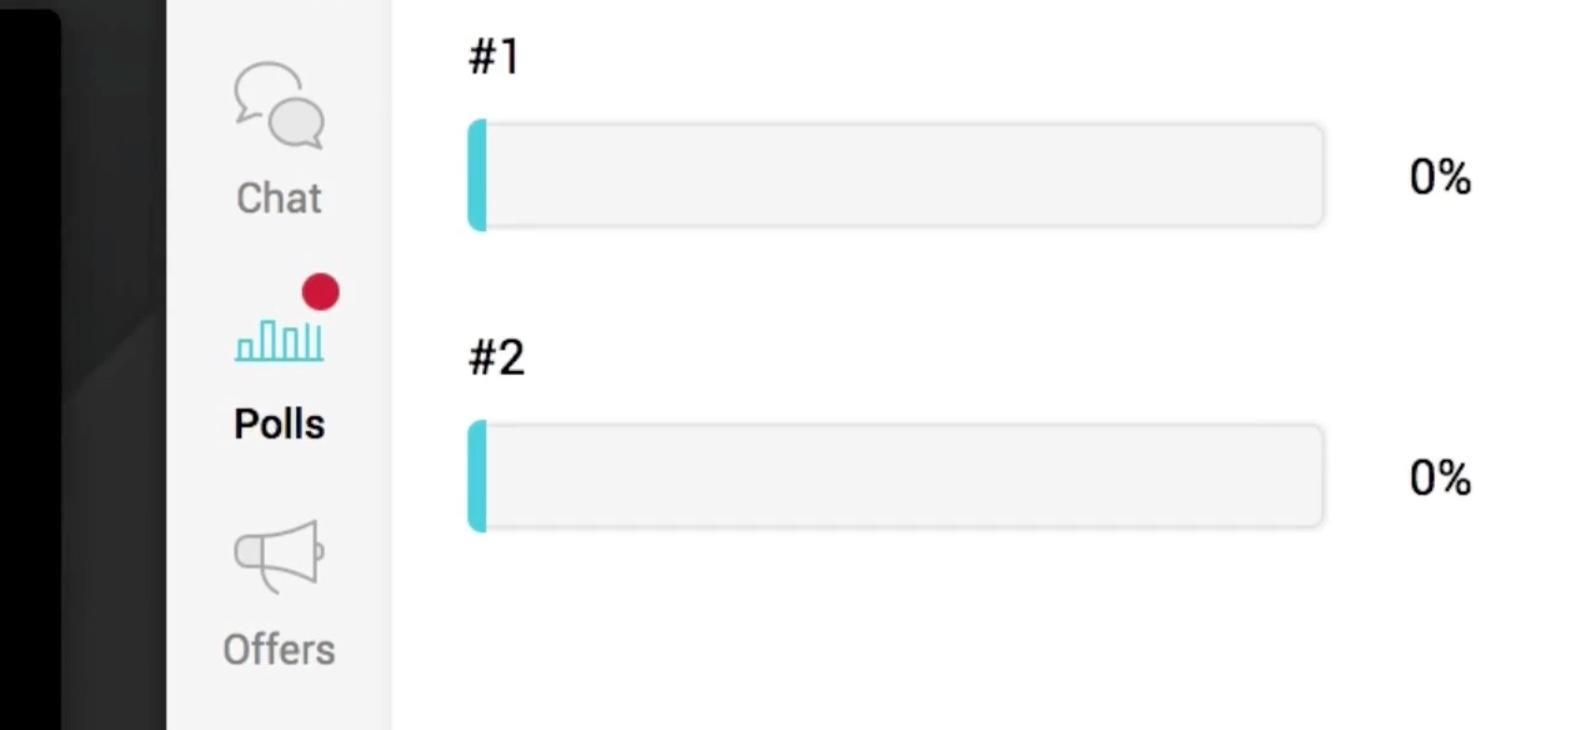 WebinarJam Poll Function